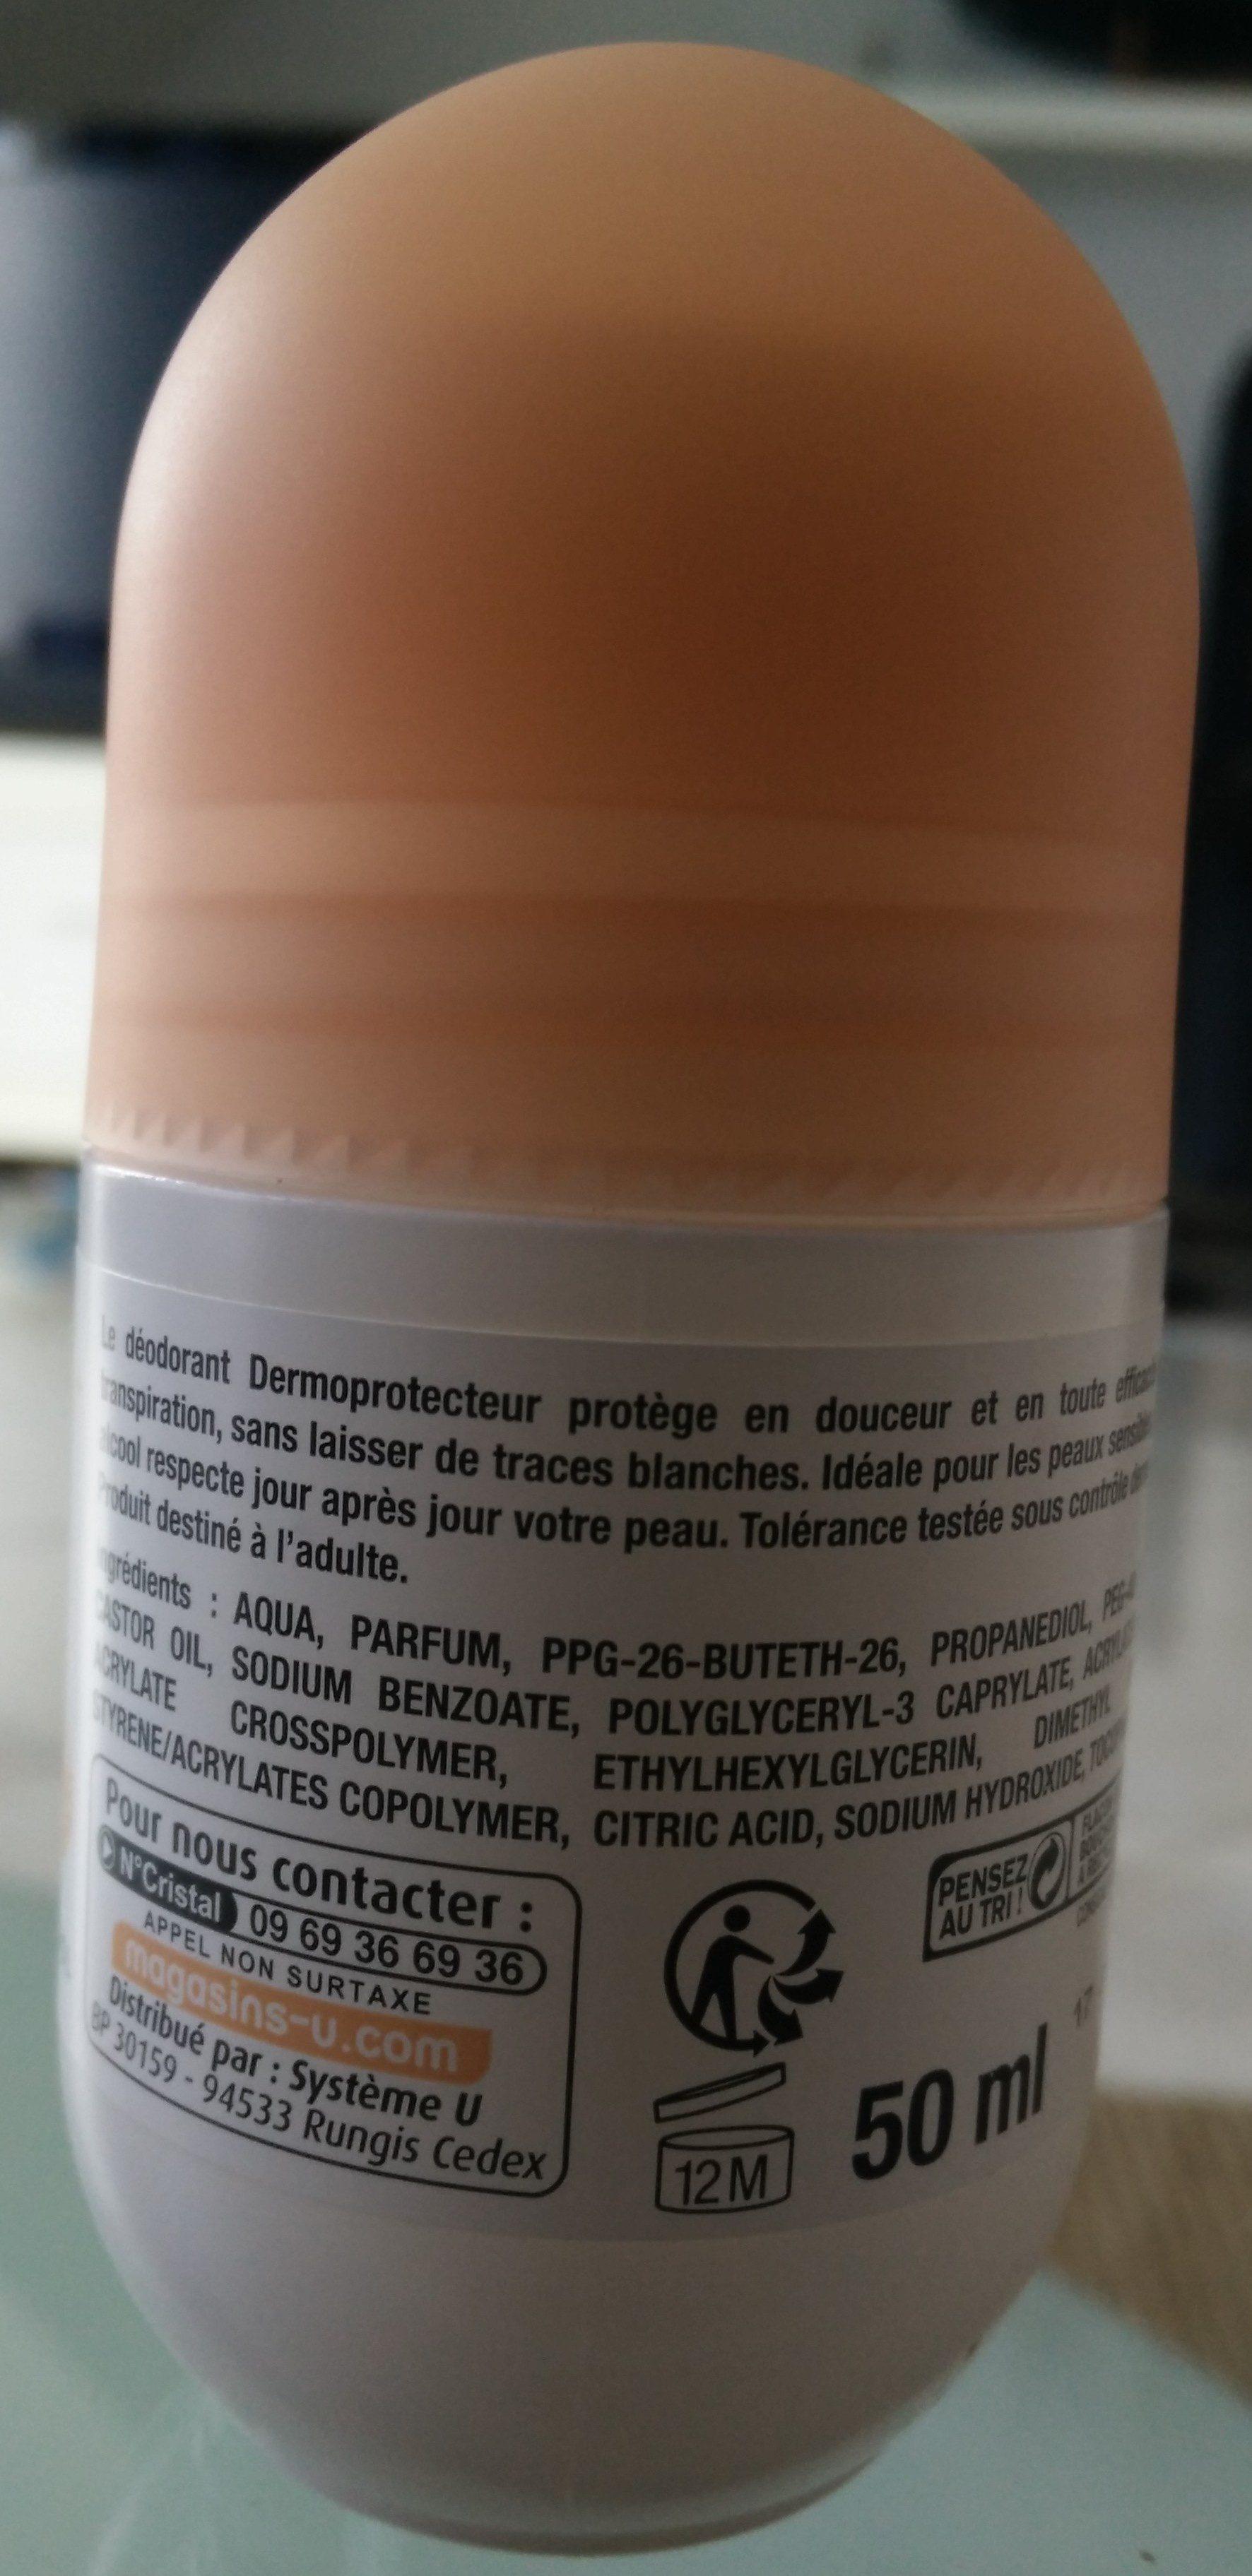 Déodorant soin Dermo Protecteur - Ingredients - fr